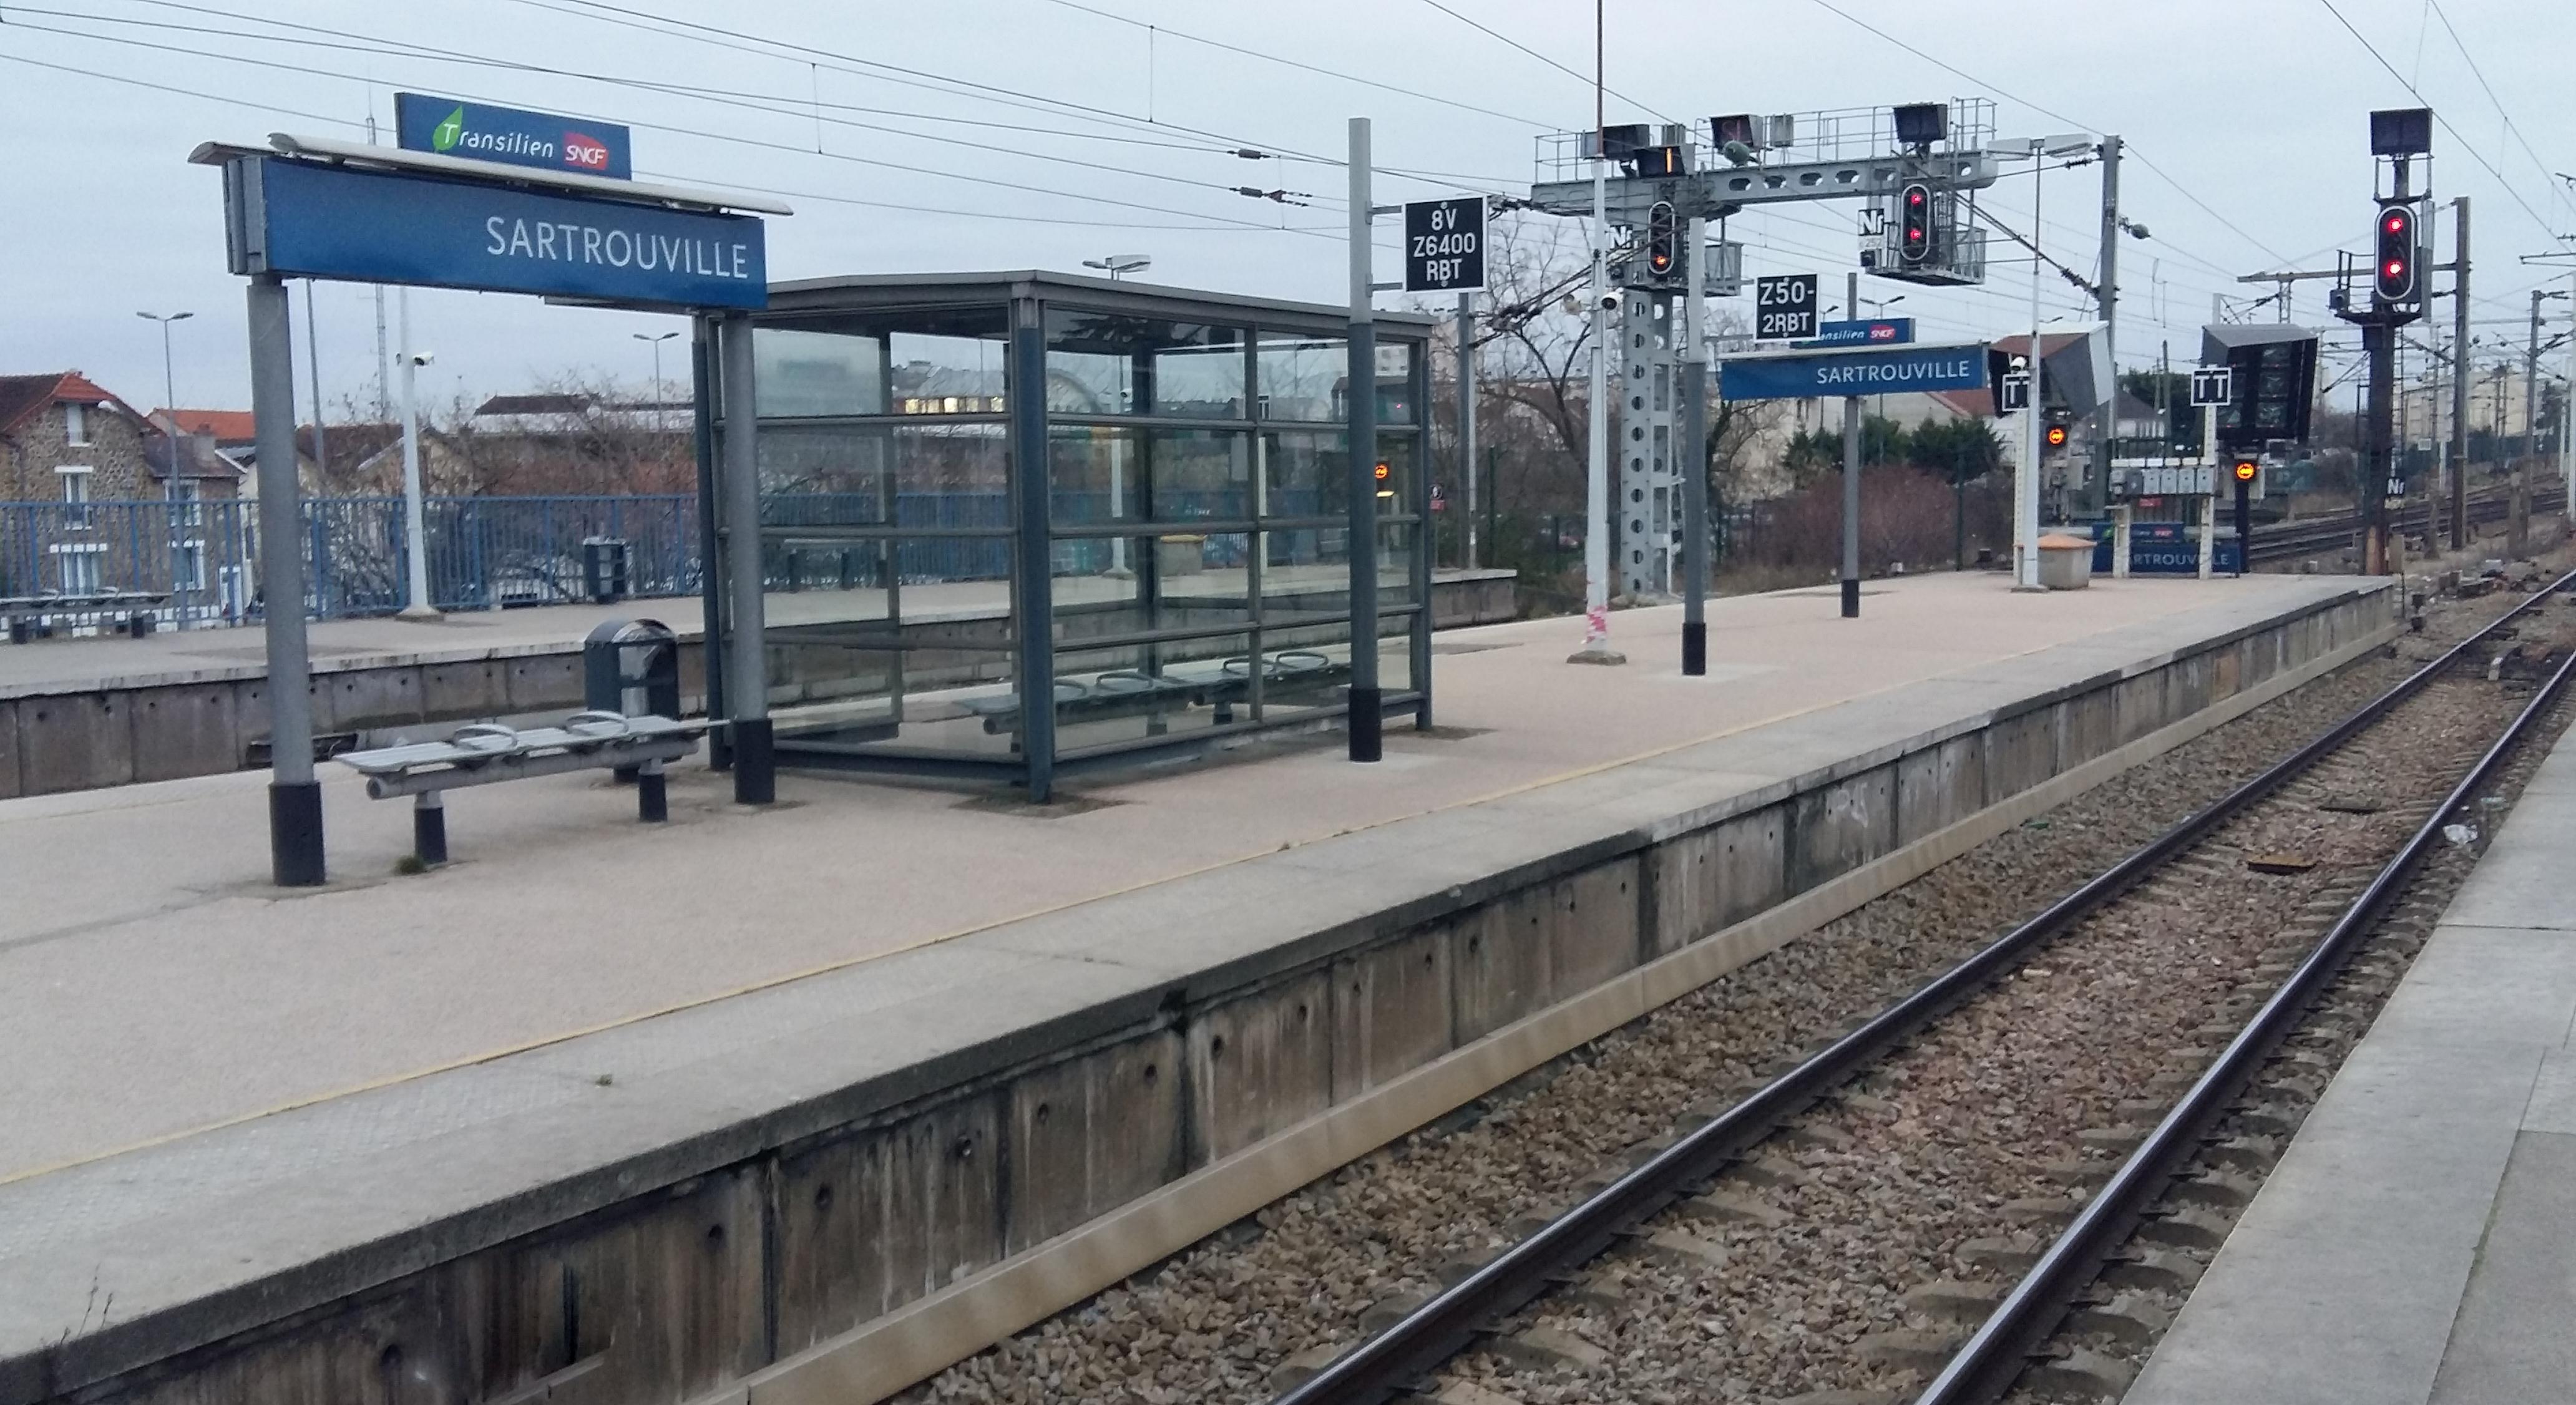 Travaux rer a cergy poissy vos trains ne circulent plus for Piscine cergy prefecture